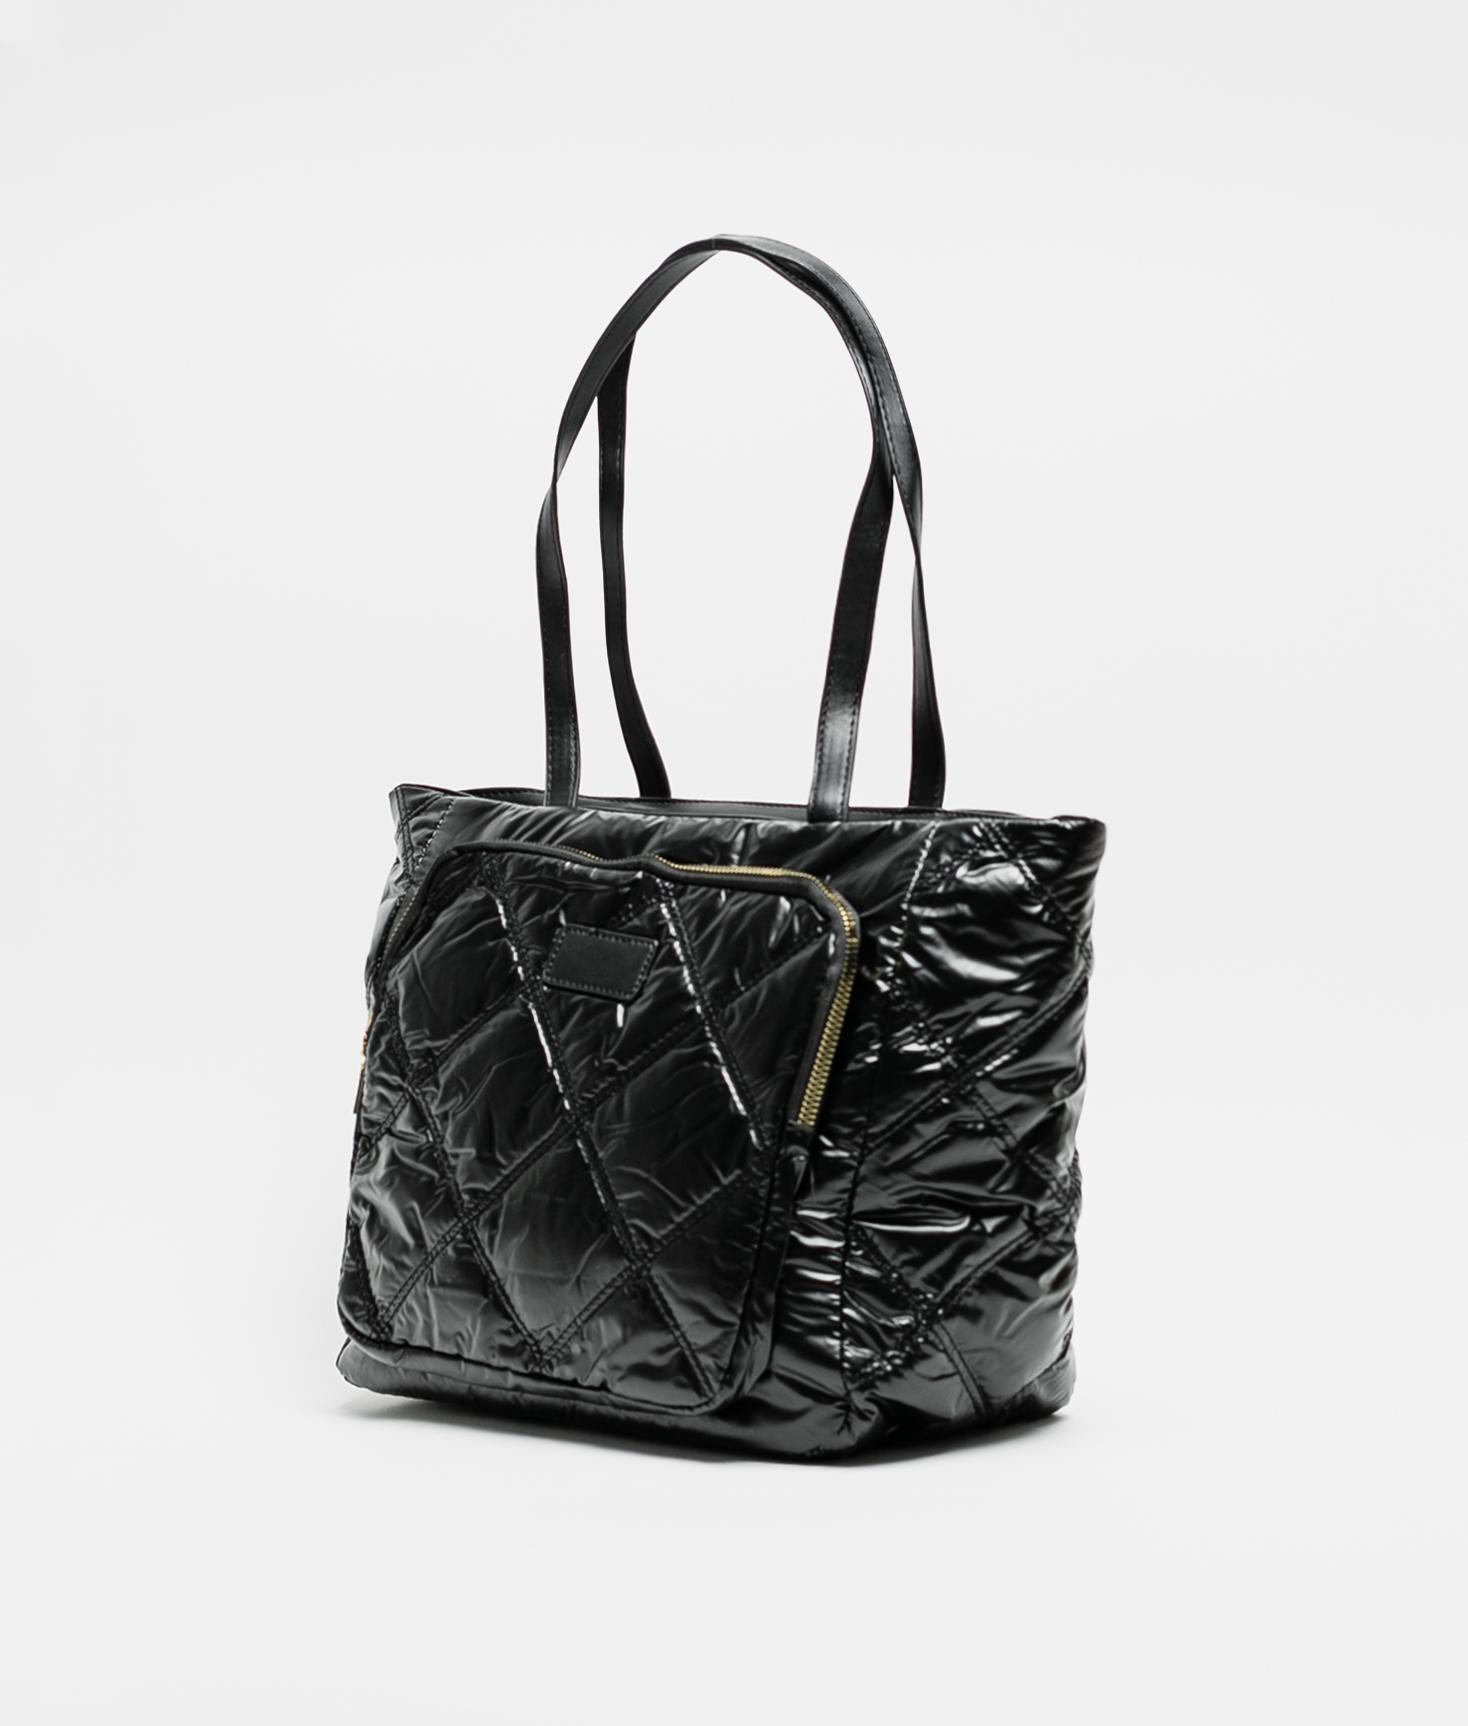 COLCY BAG - BLACK